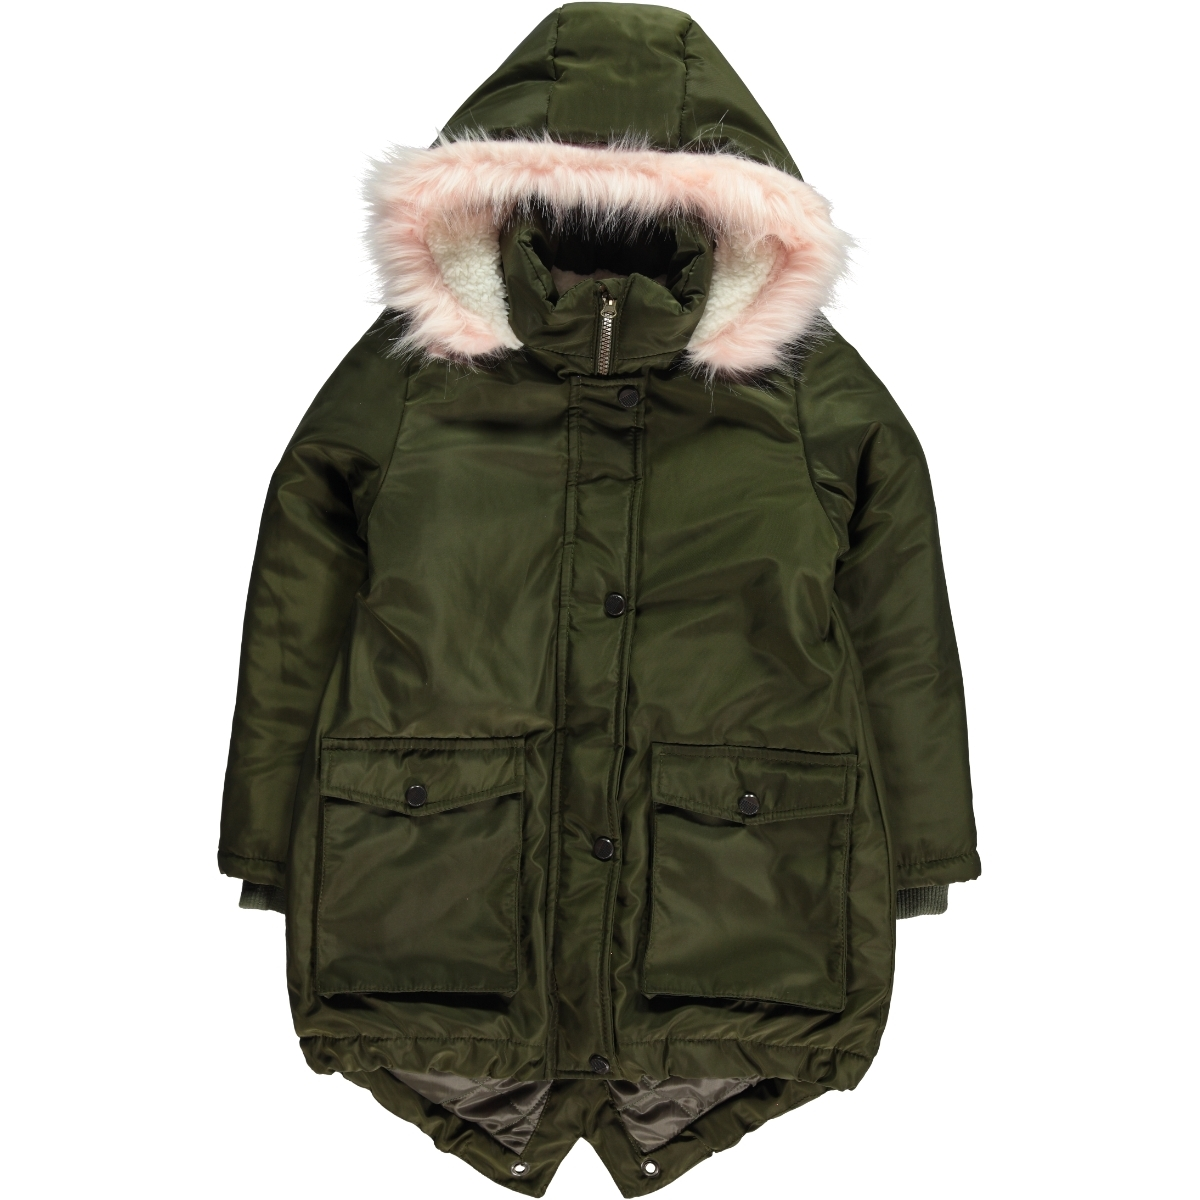 Civil Girls Girl Khaki Hooded Jacket Age 6-9